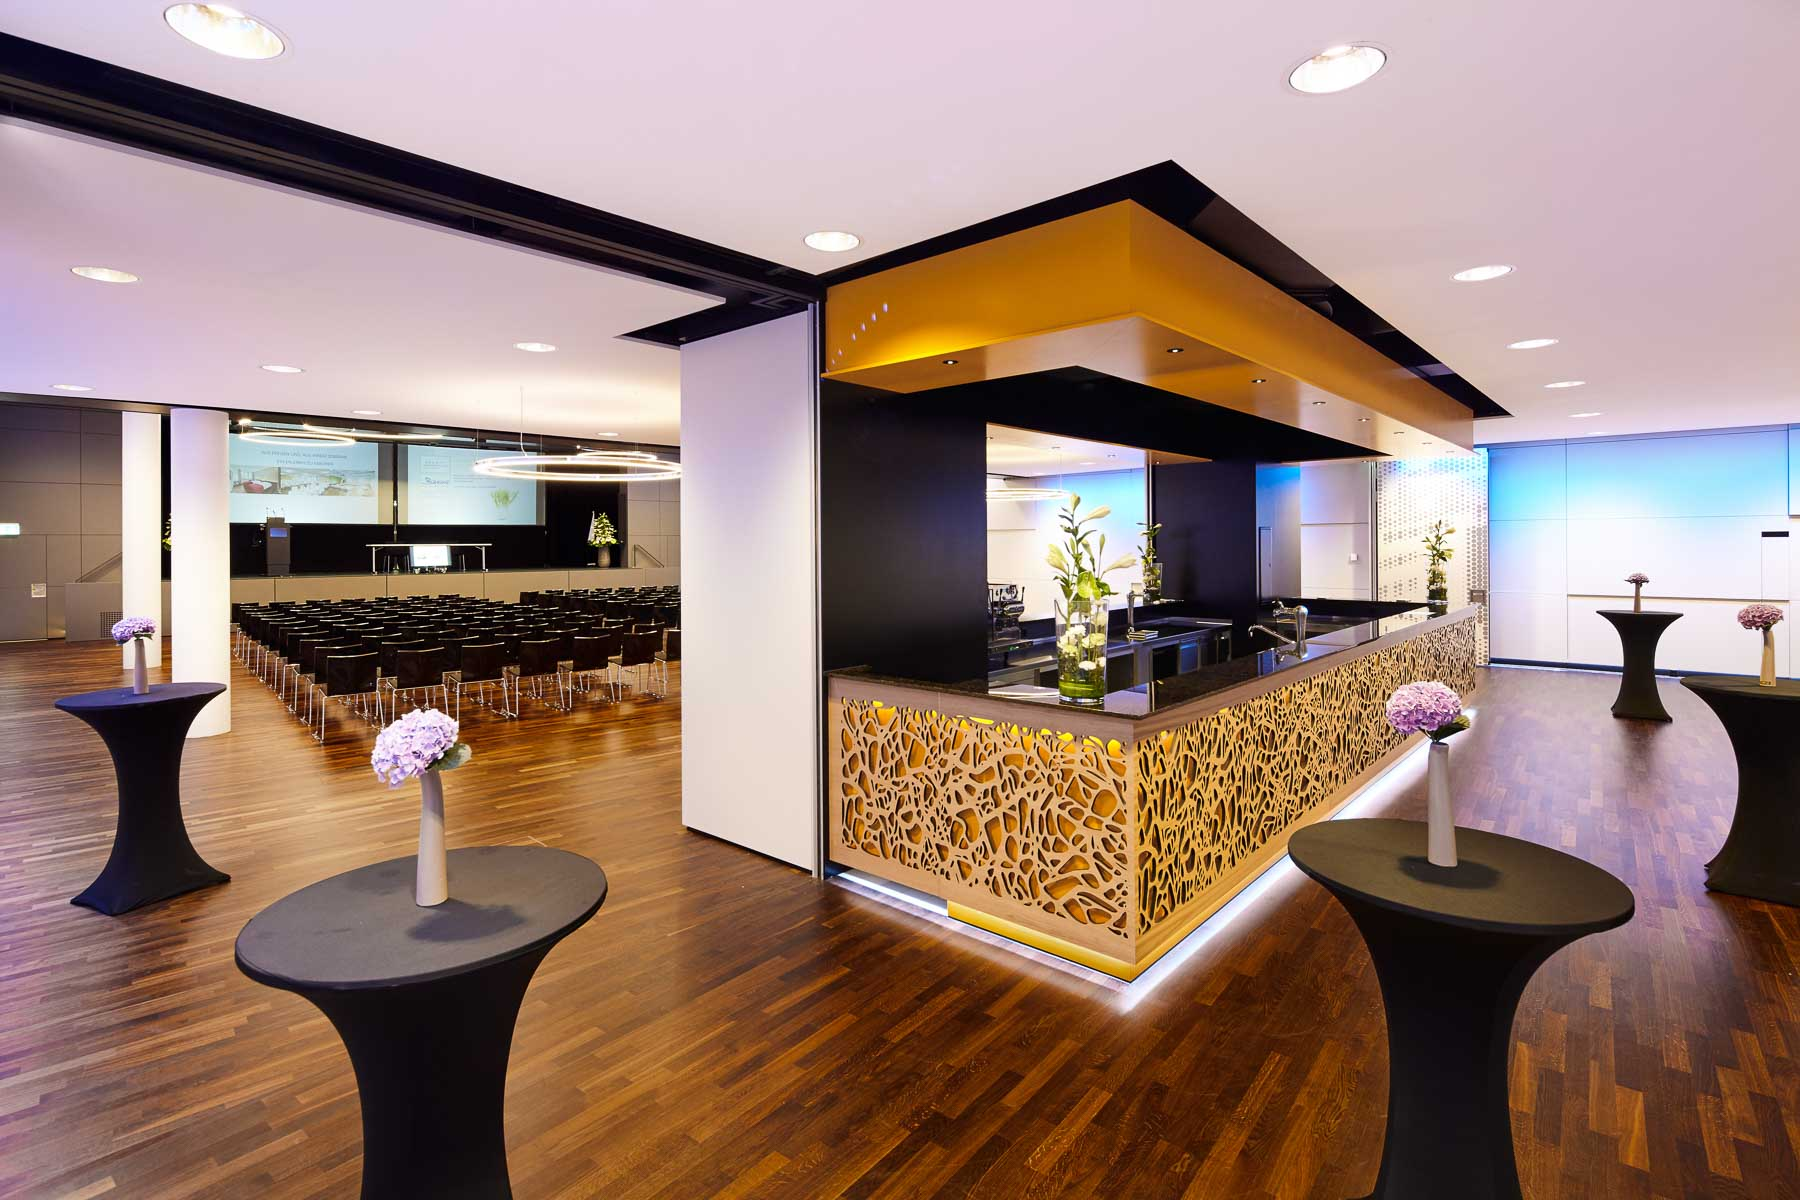 Barfront-Cladding-Bruag_Oak-Plywood-18mm_Perforation-40200_Hotel-Bananacity-Winterthur_1.jpg